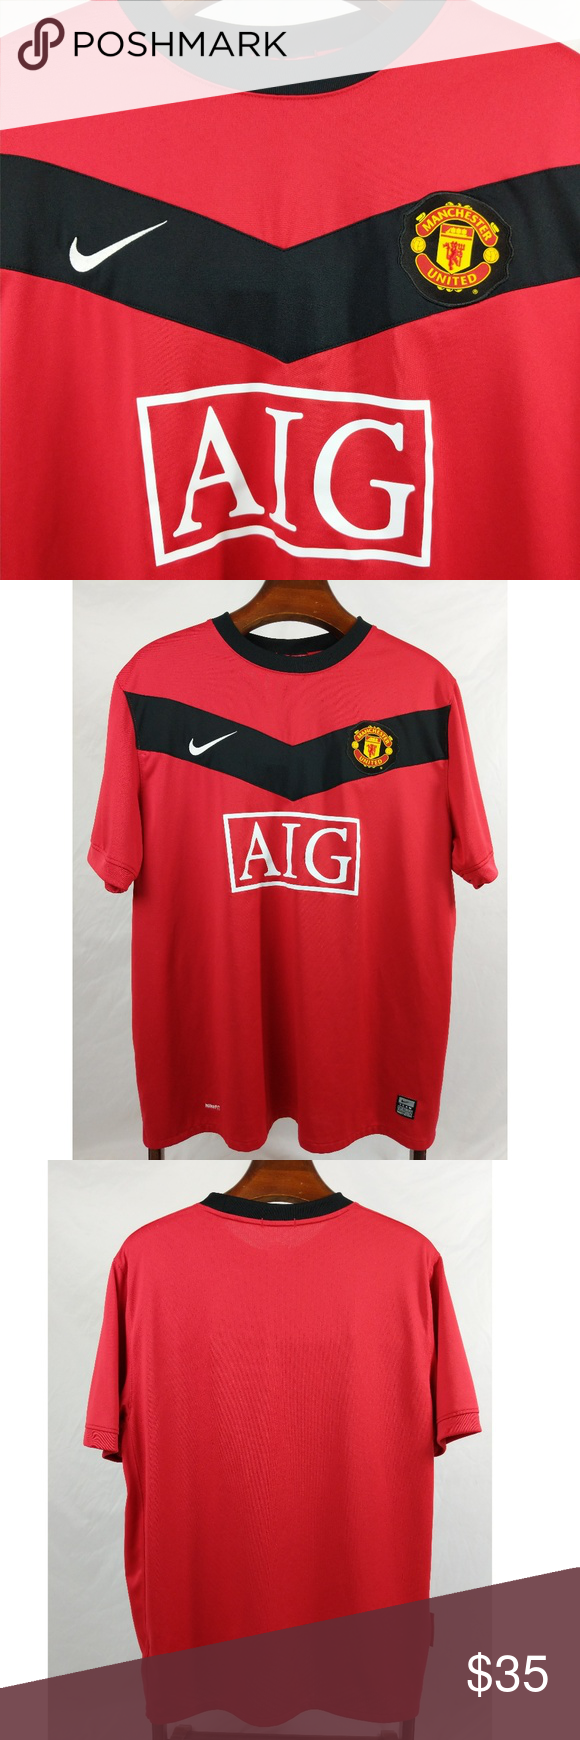 3bbe971759a Nike Manchester United Football Soccer Jersey Nike Manchester United  Football Soccer Jersey Shirt Mens XL AIG